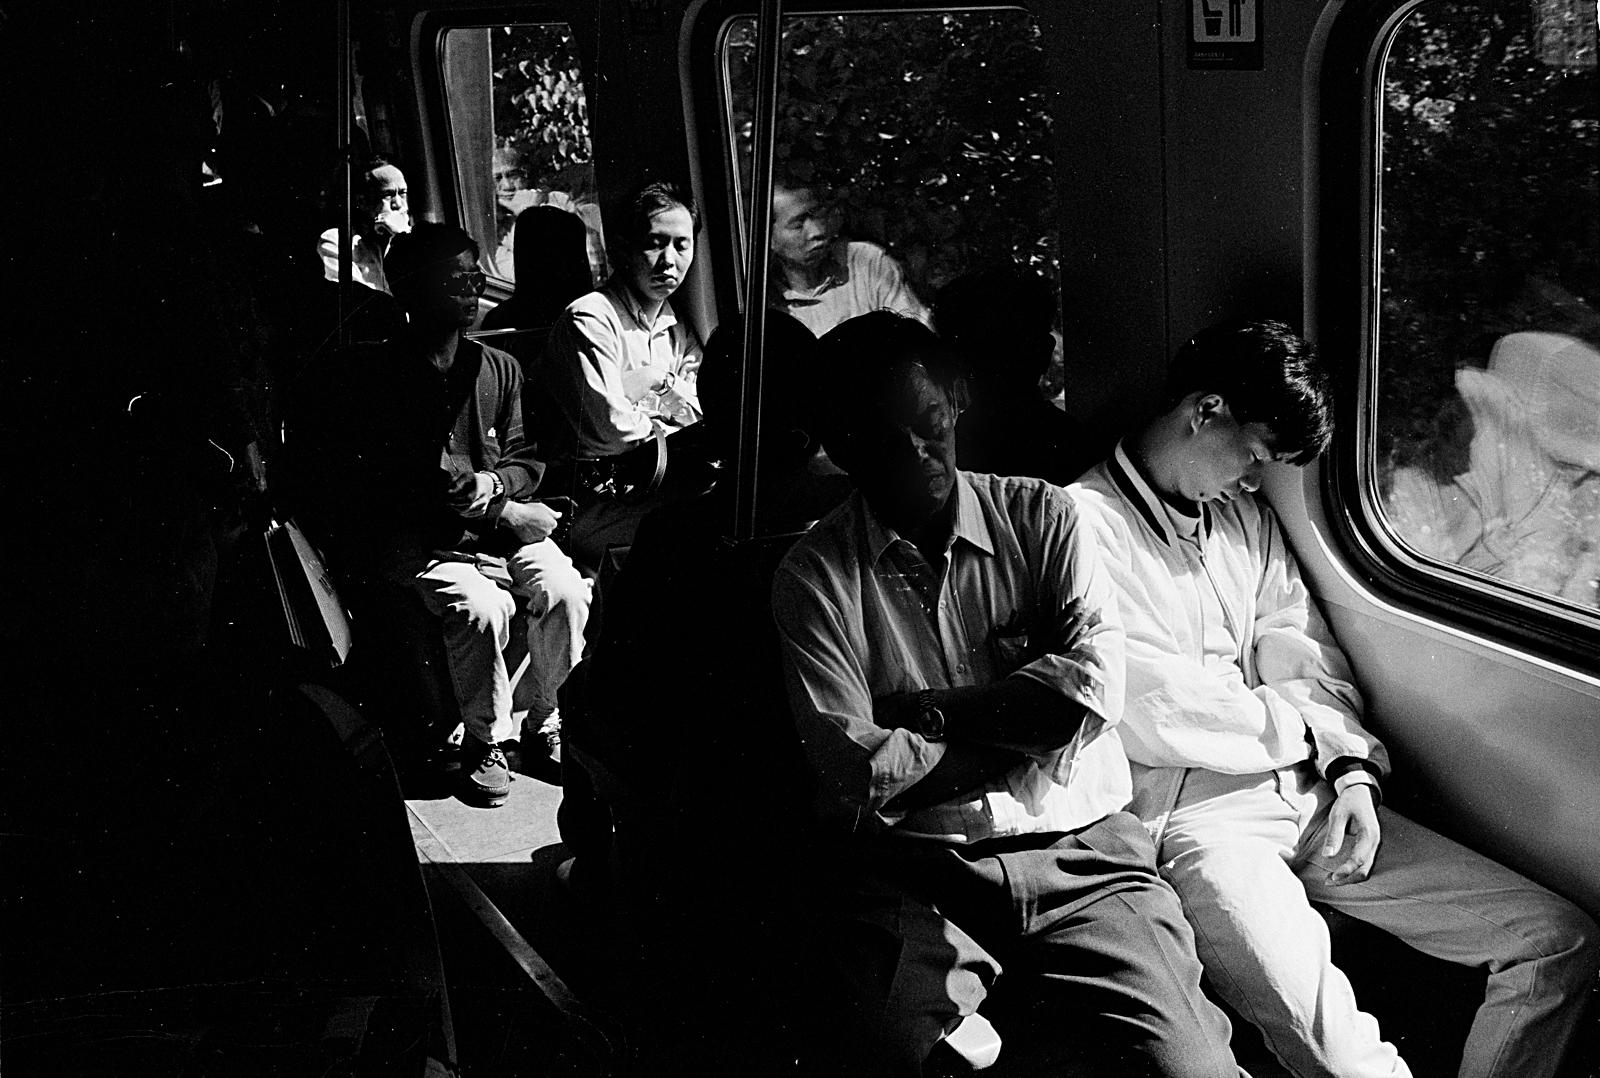 hk_shatin_commuters_5k_untitled_20130731.jpg